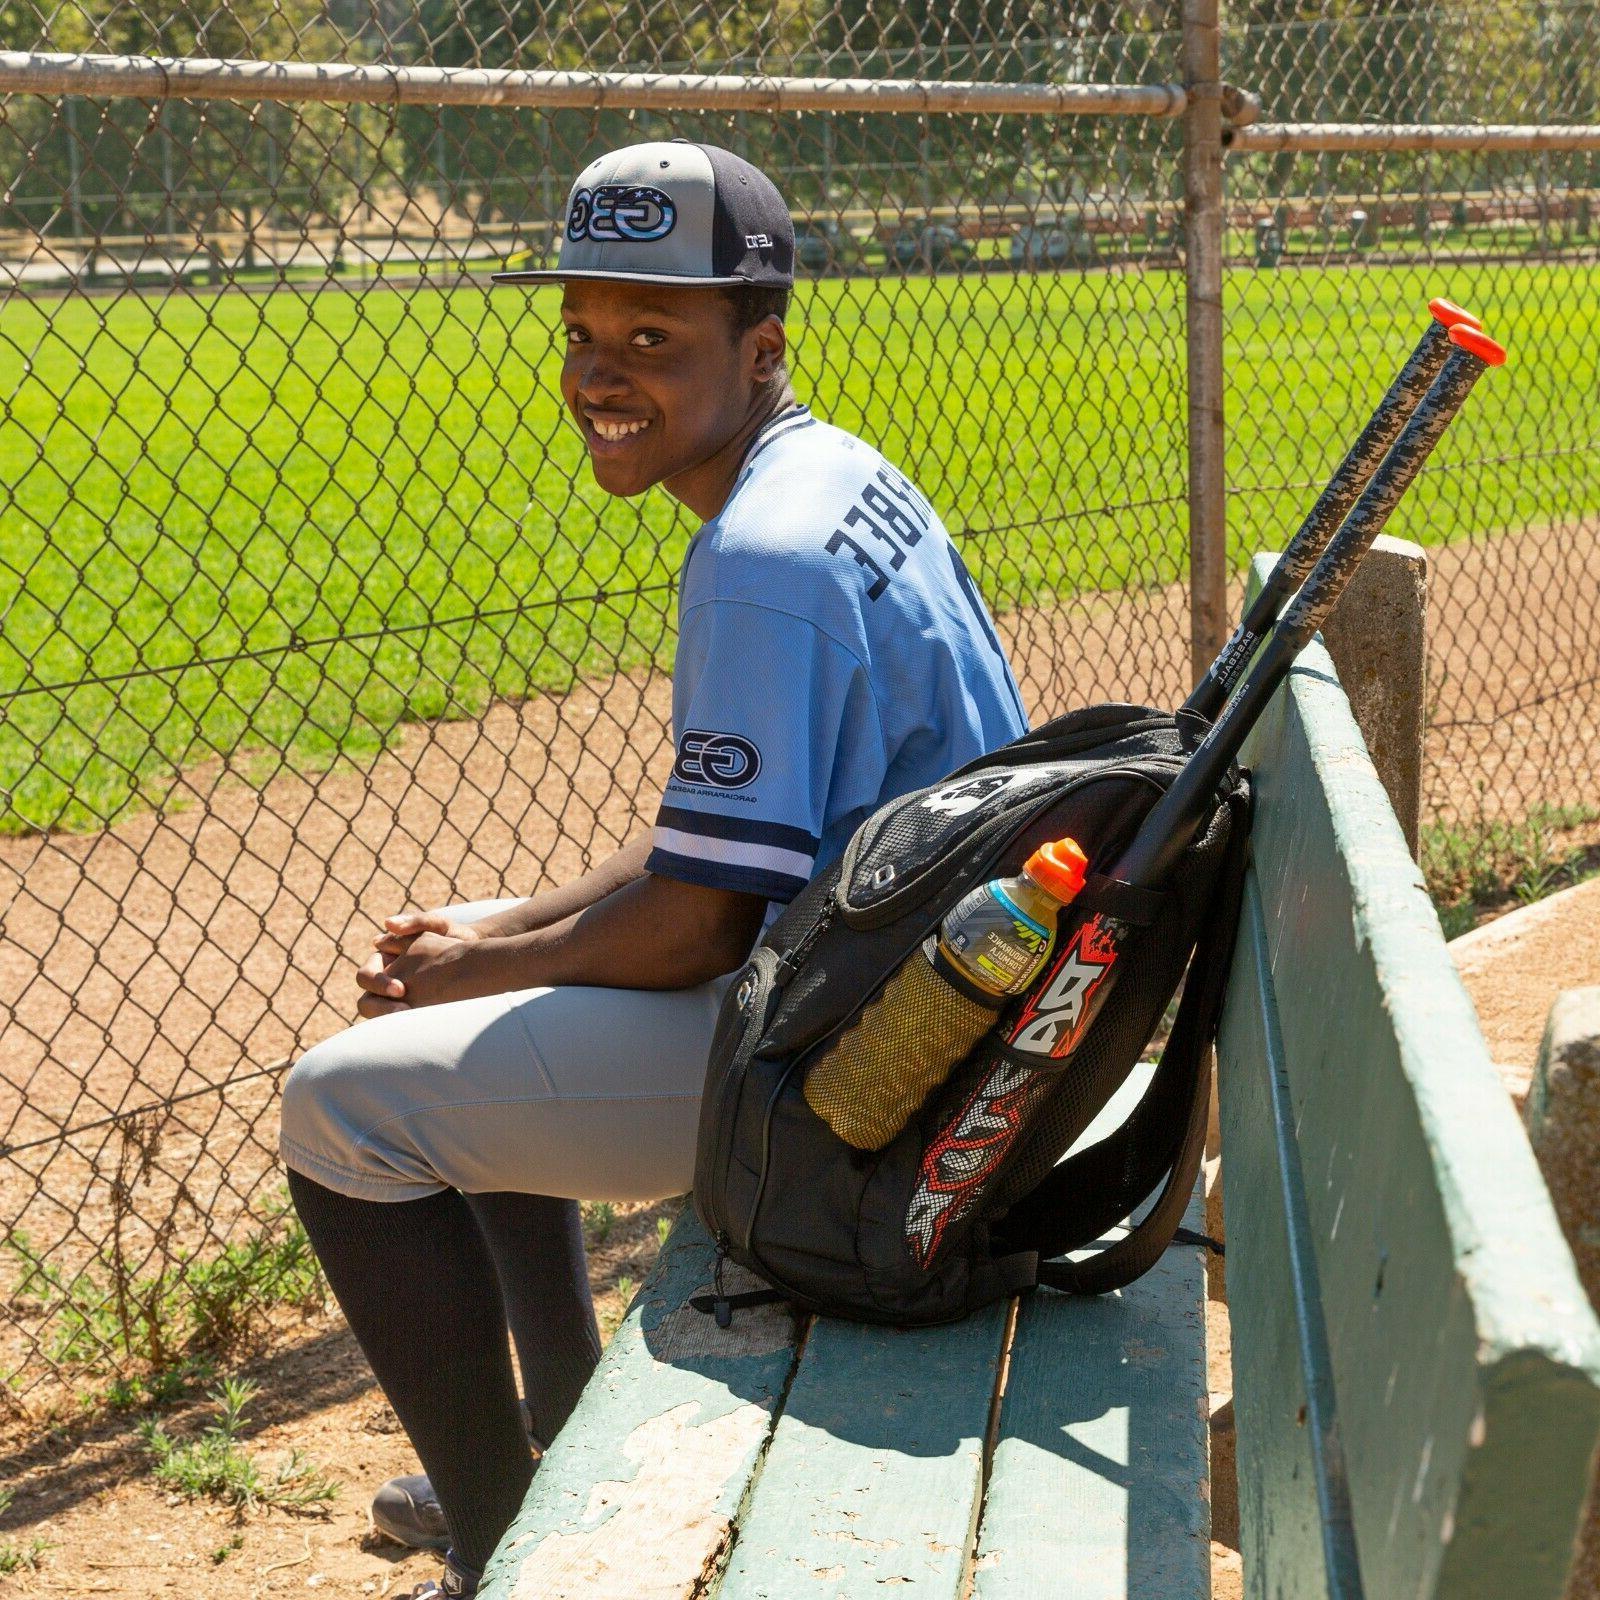 Baseball Backpack Bat Bag   Bag USB Youth &